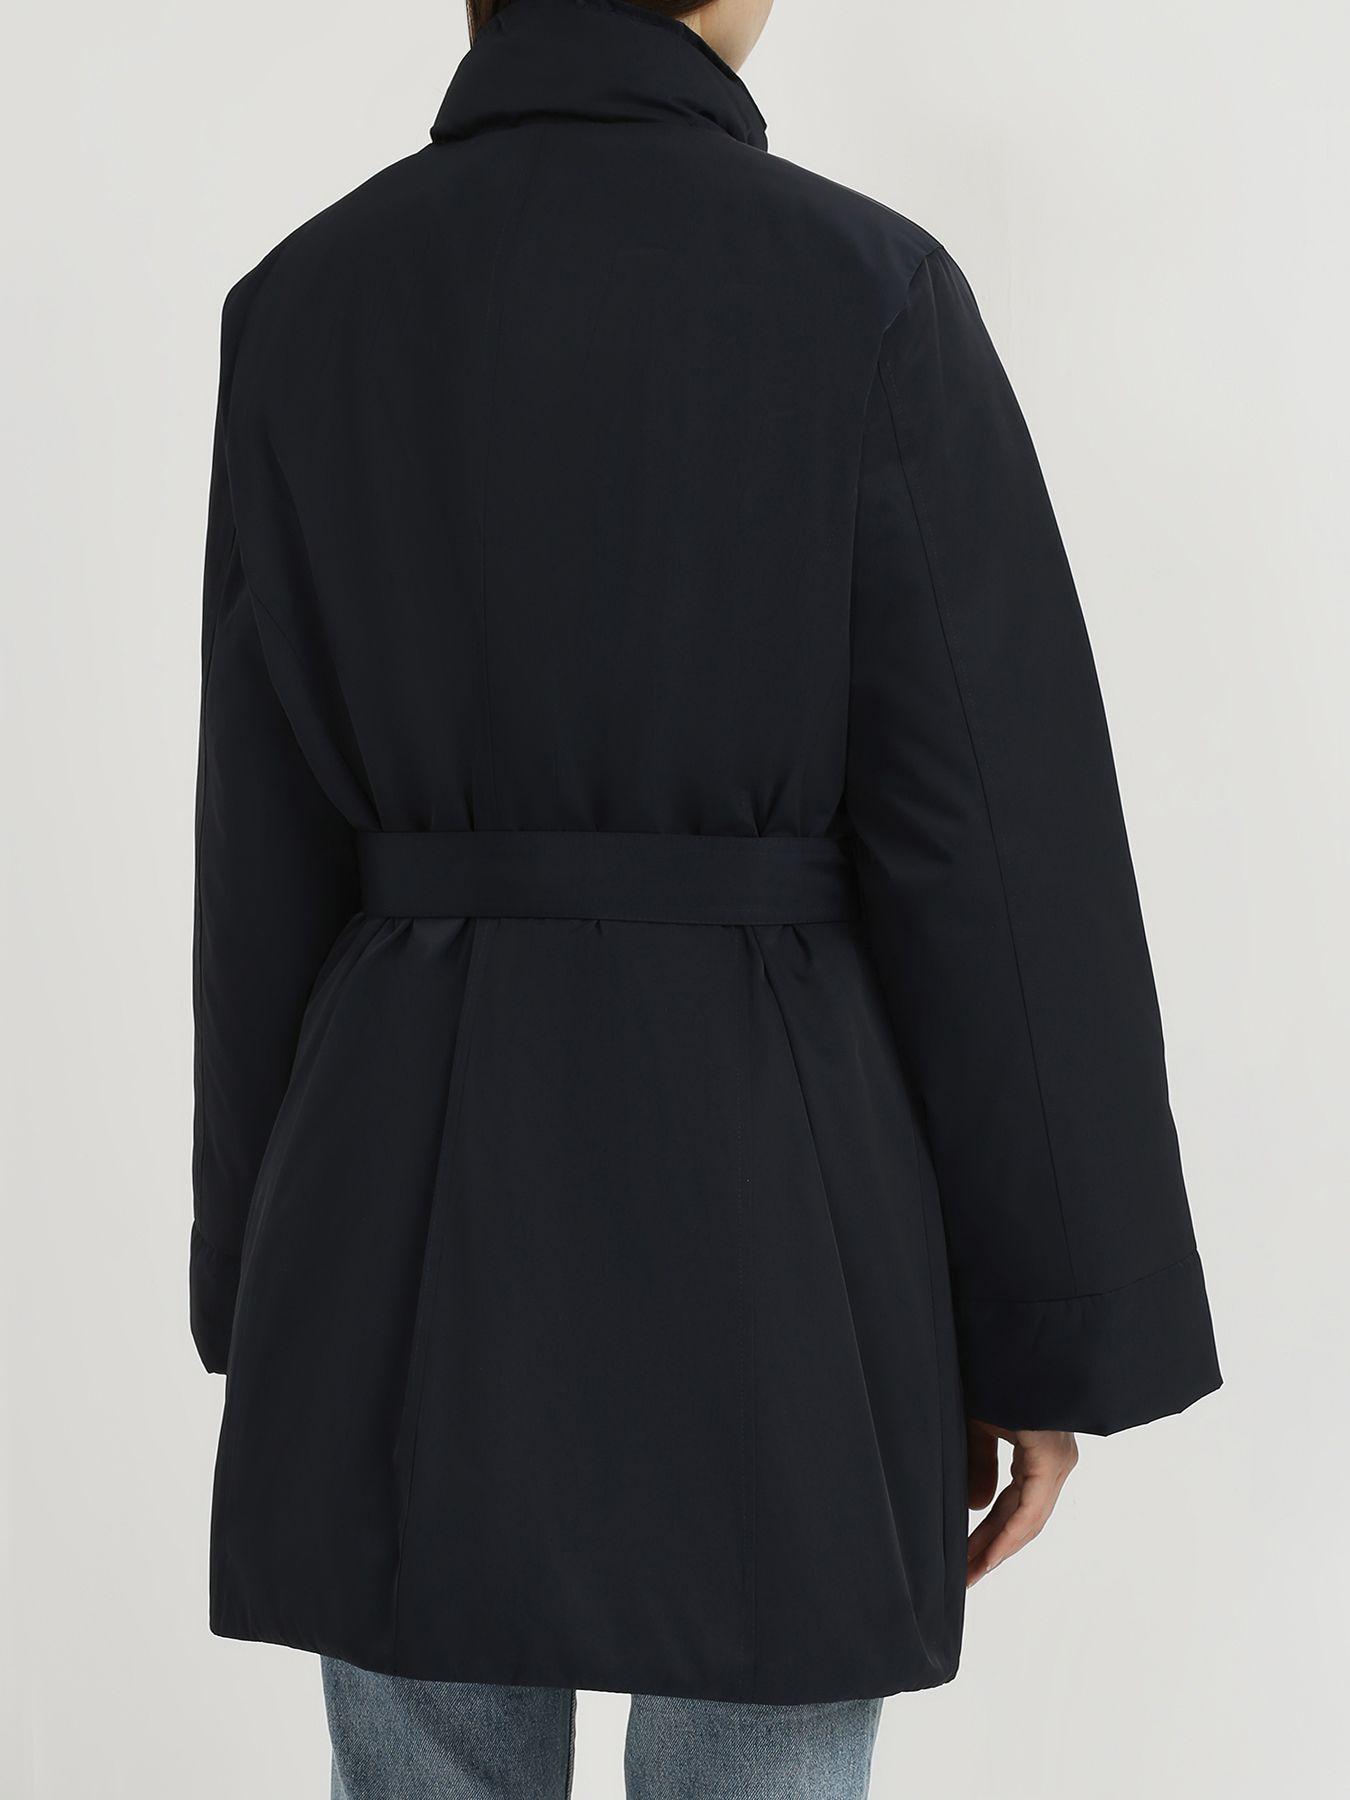 Alessandro Manzoni Purpur | Alessandro Manzoni Purpur Куртка без капюшона | Clouty